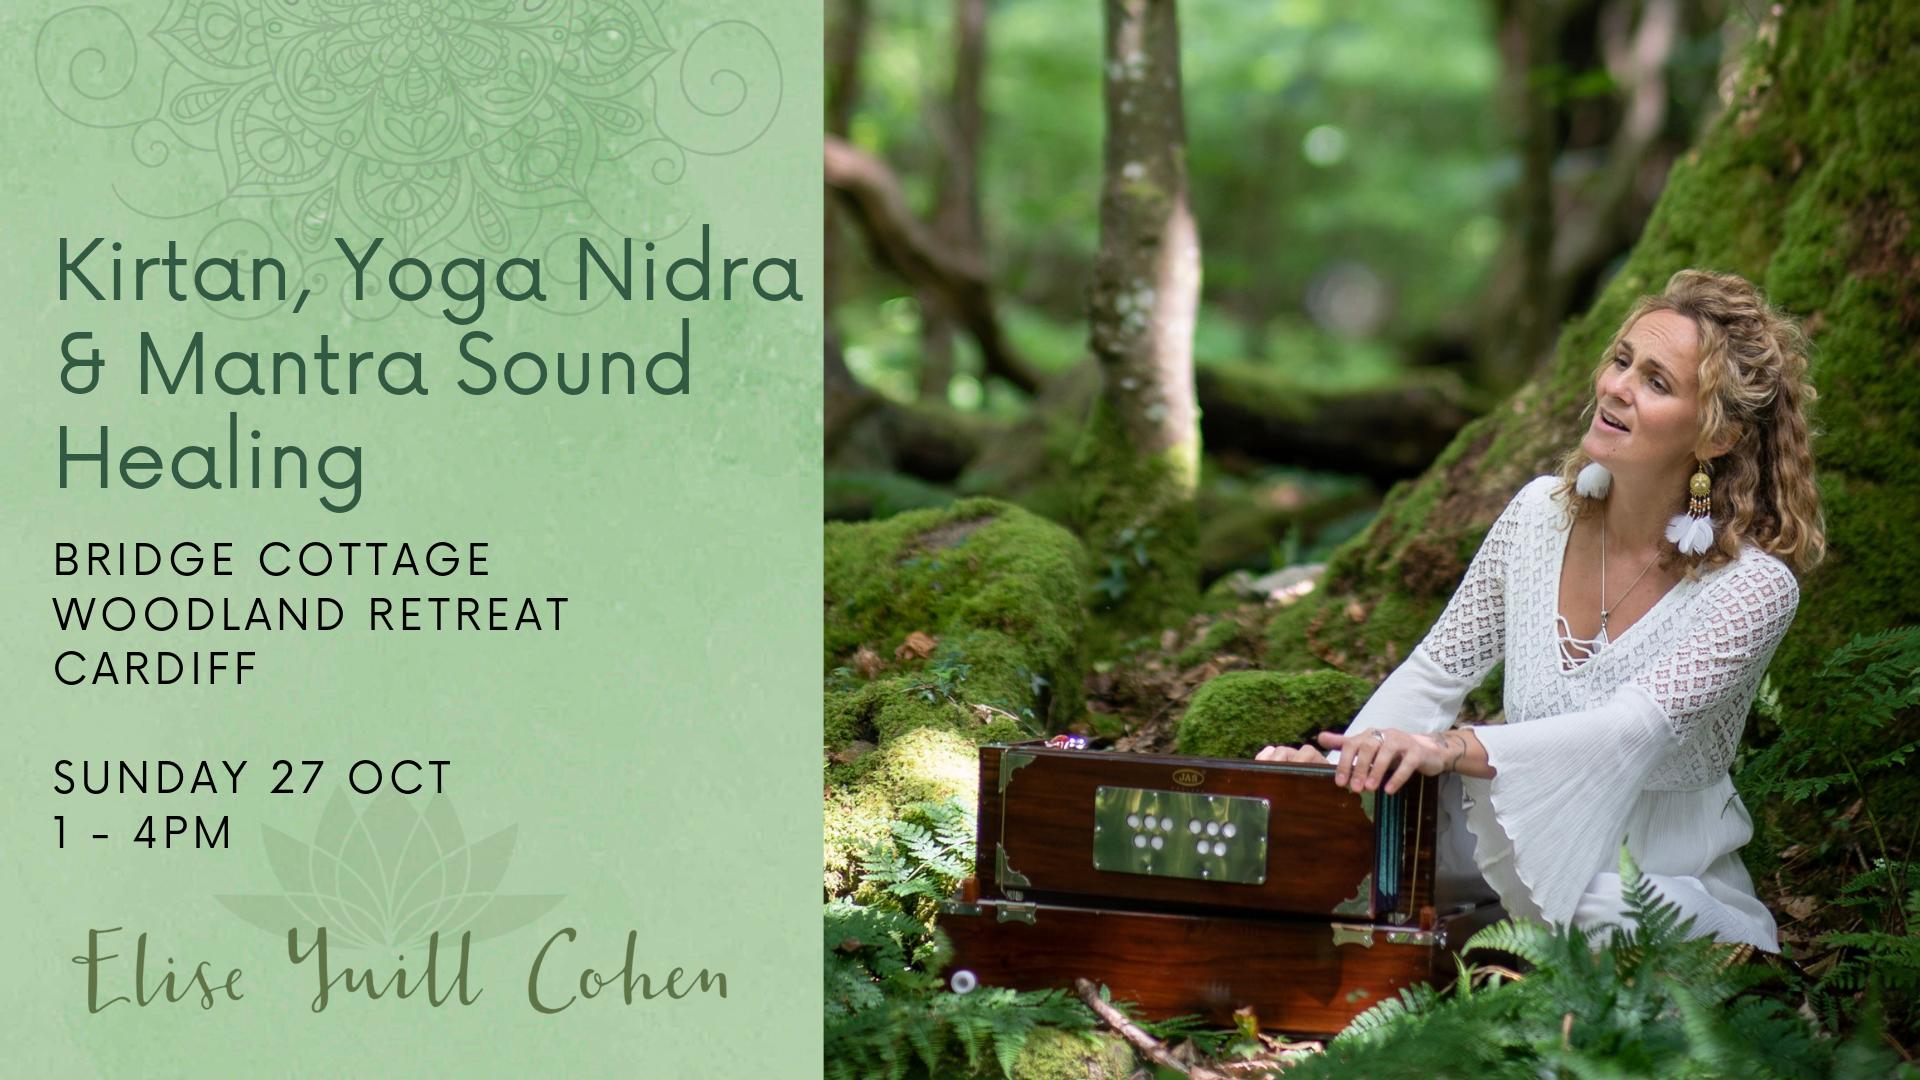 Copy of FB Event Template - KIRTAN, YOGA NIDRA & MANTRA SOUND HEALING (Cardiff).png